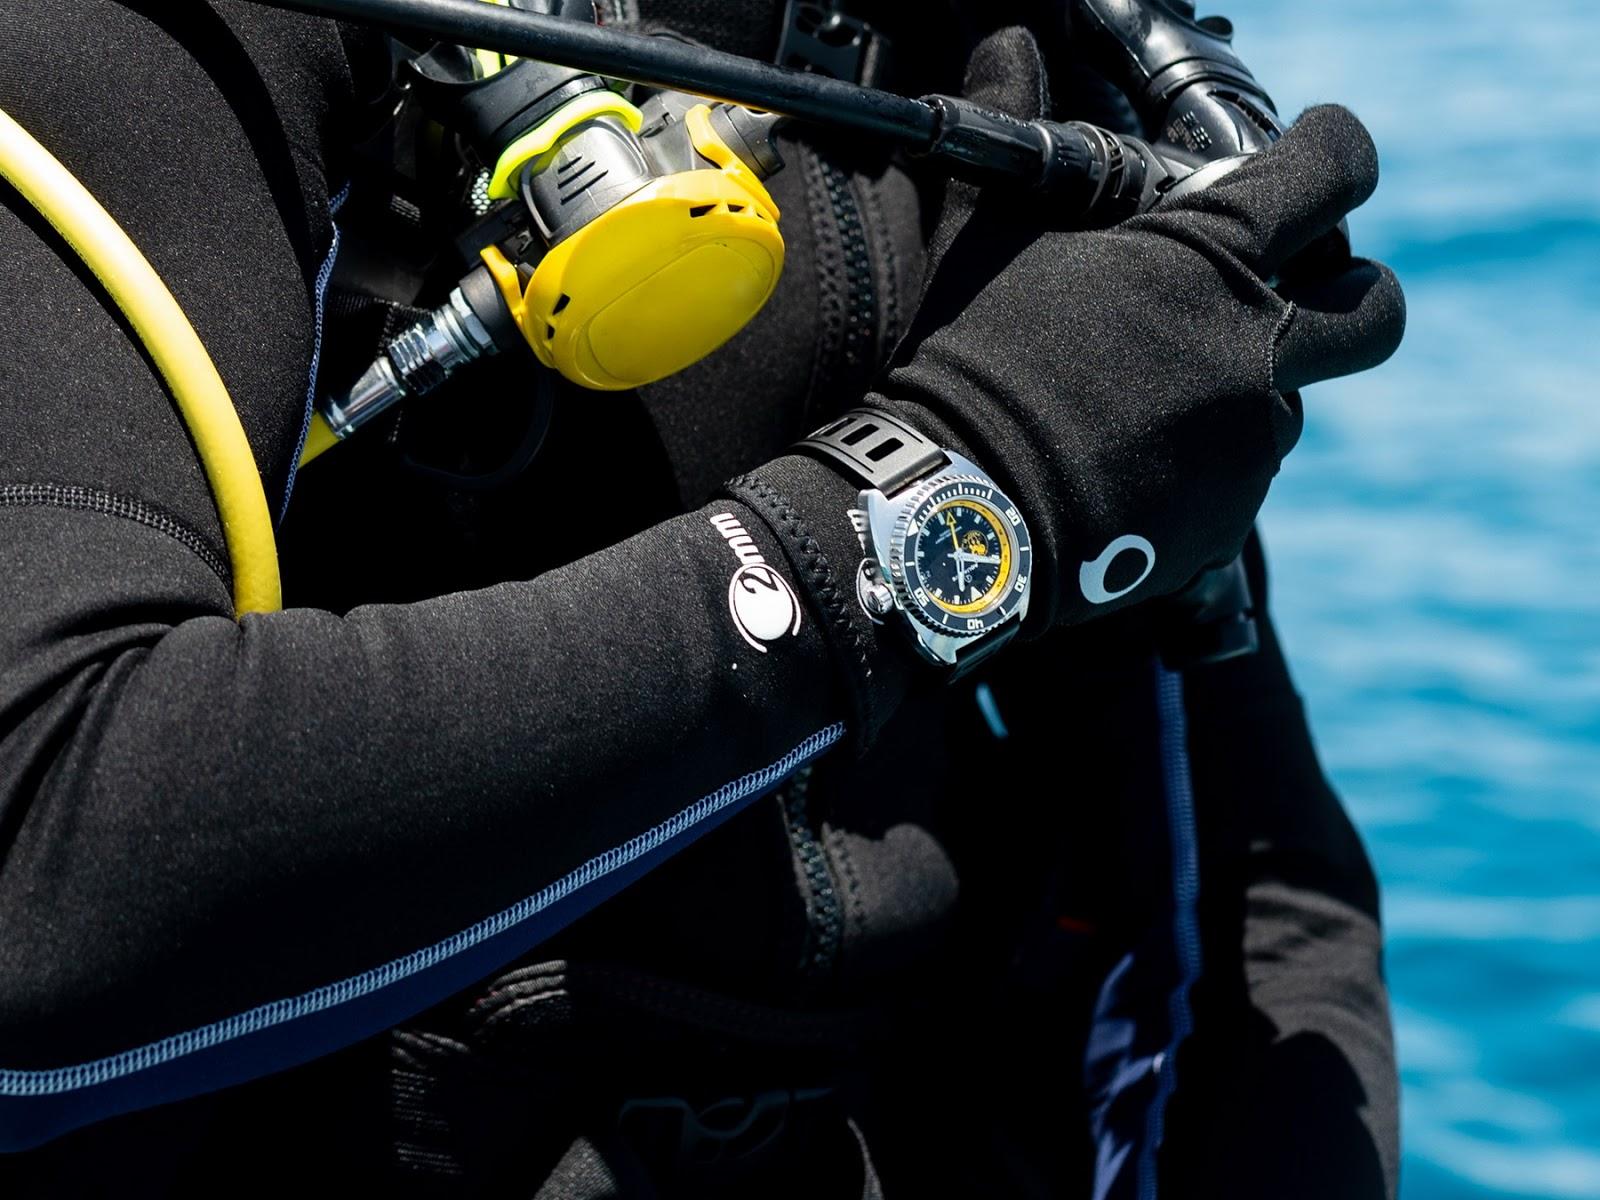 Aquadive's new Poseidon GMT AQUADIVE+Bathyscaphe+100+GMT+POSEIDON+10